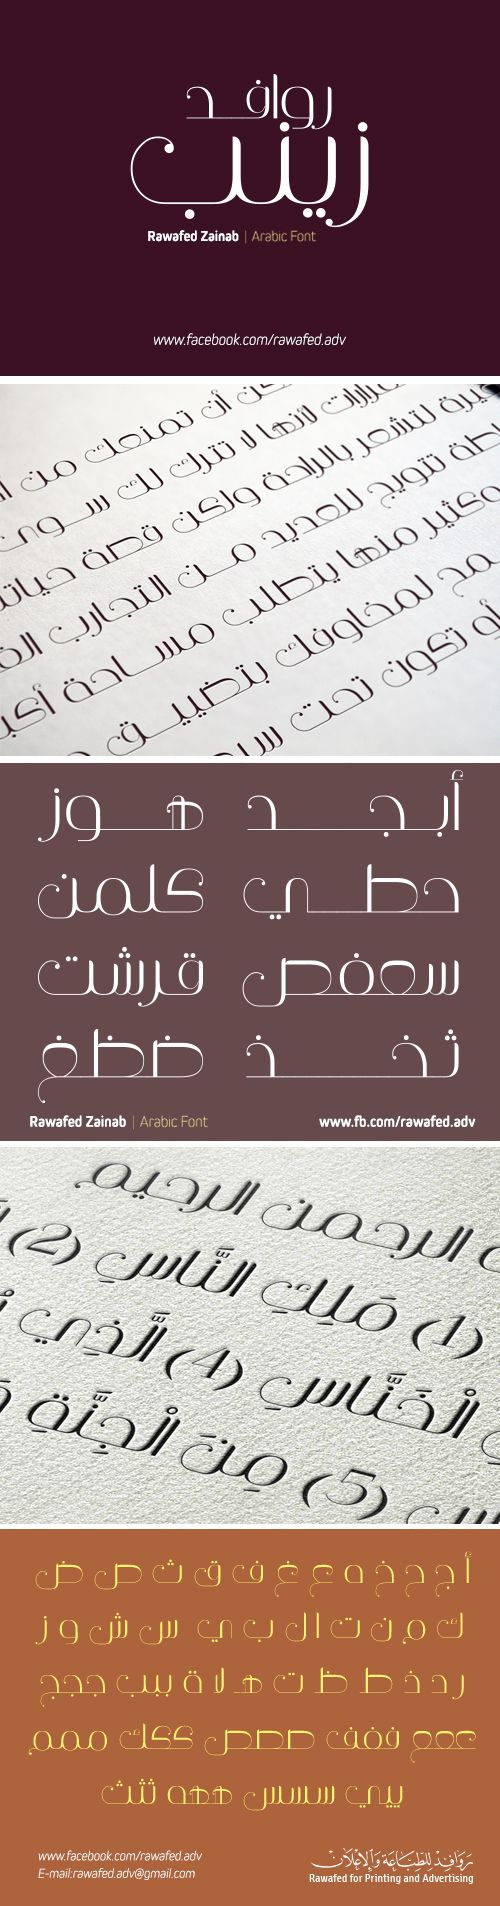 Rawafed Zainab Arabic Font on Behance